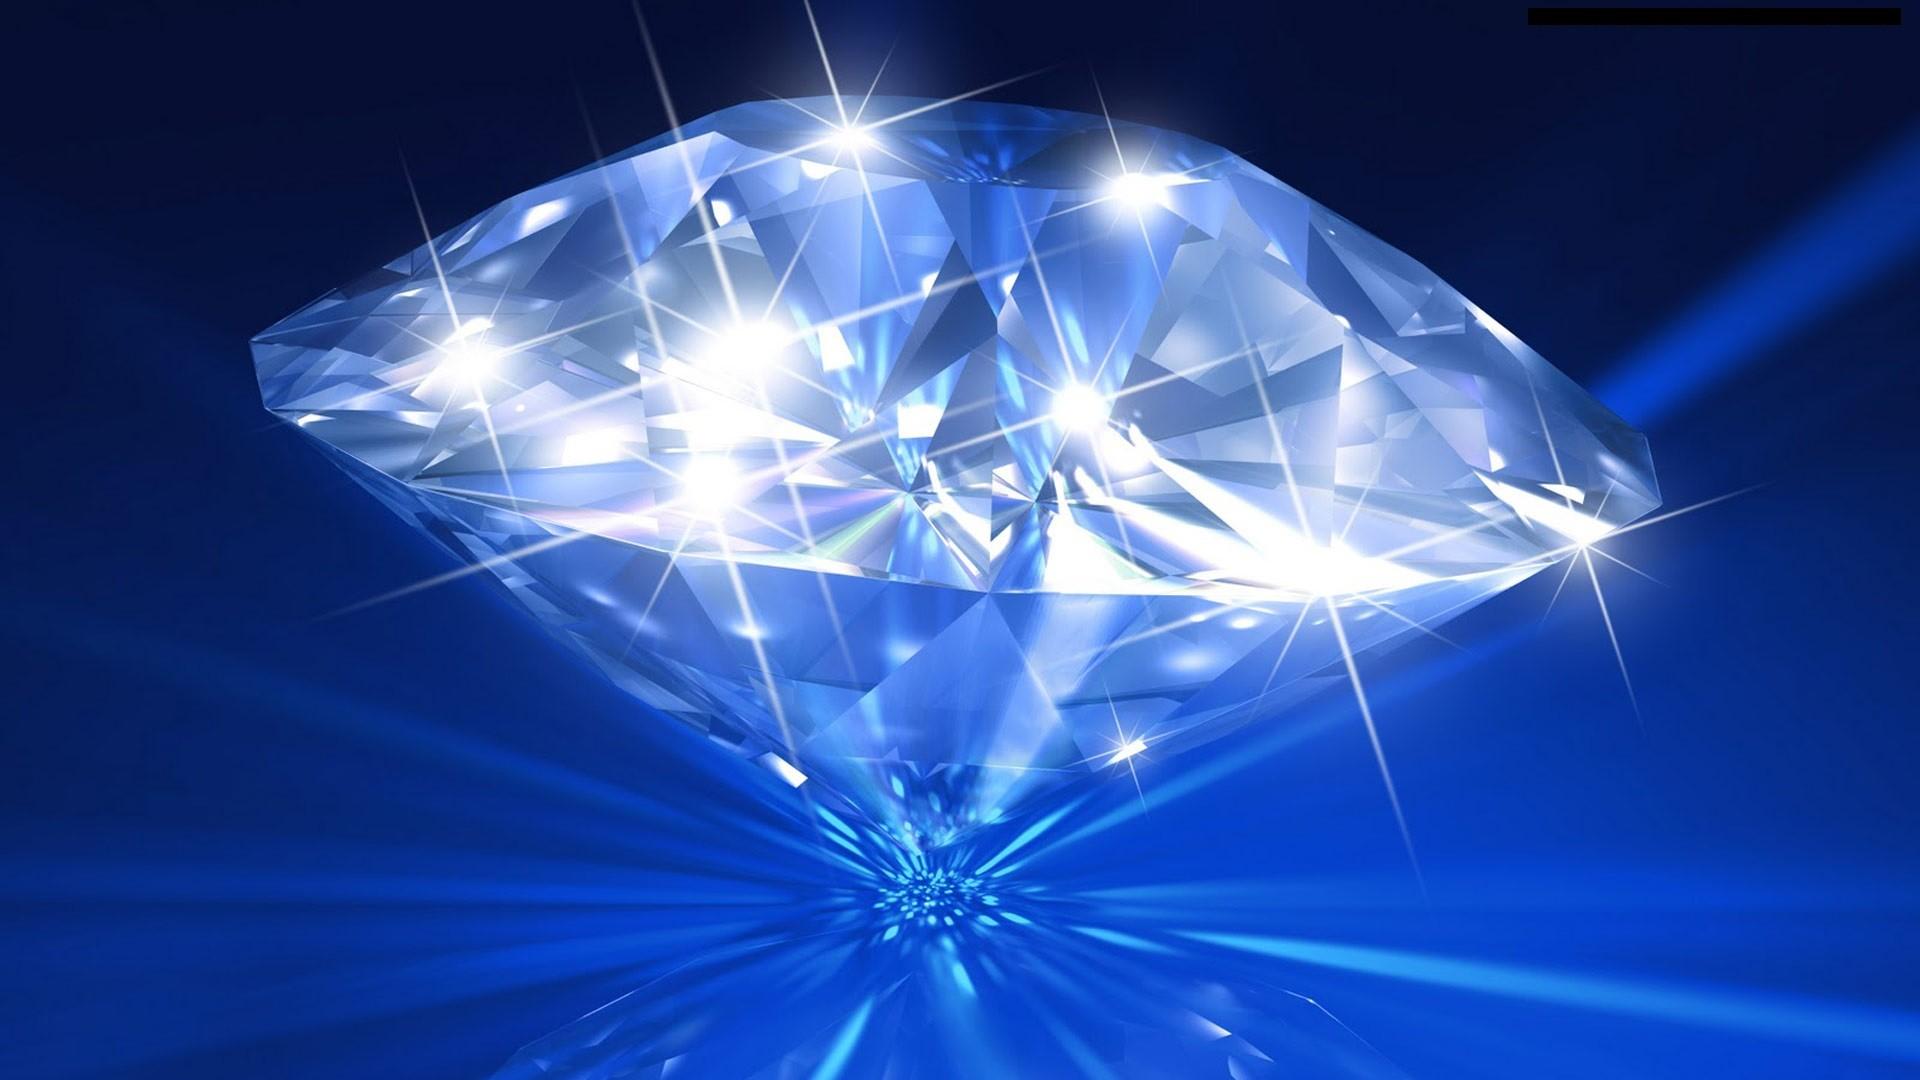 Blue Diamond Wallpaper 60 Images